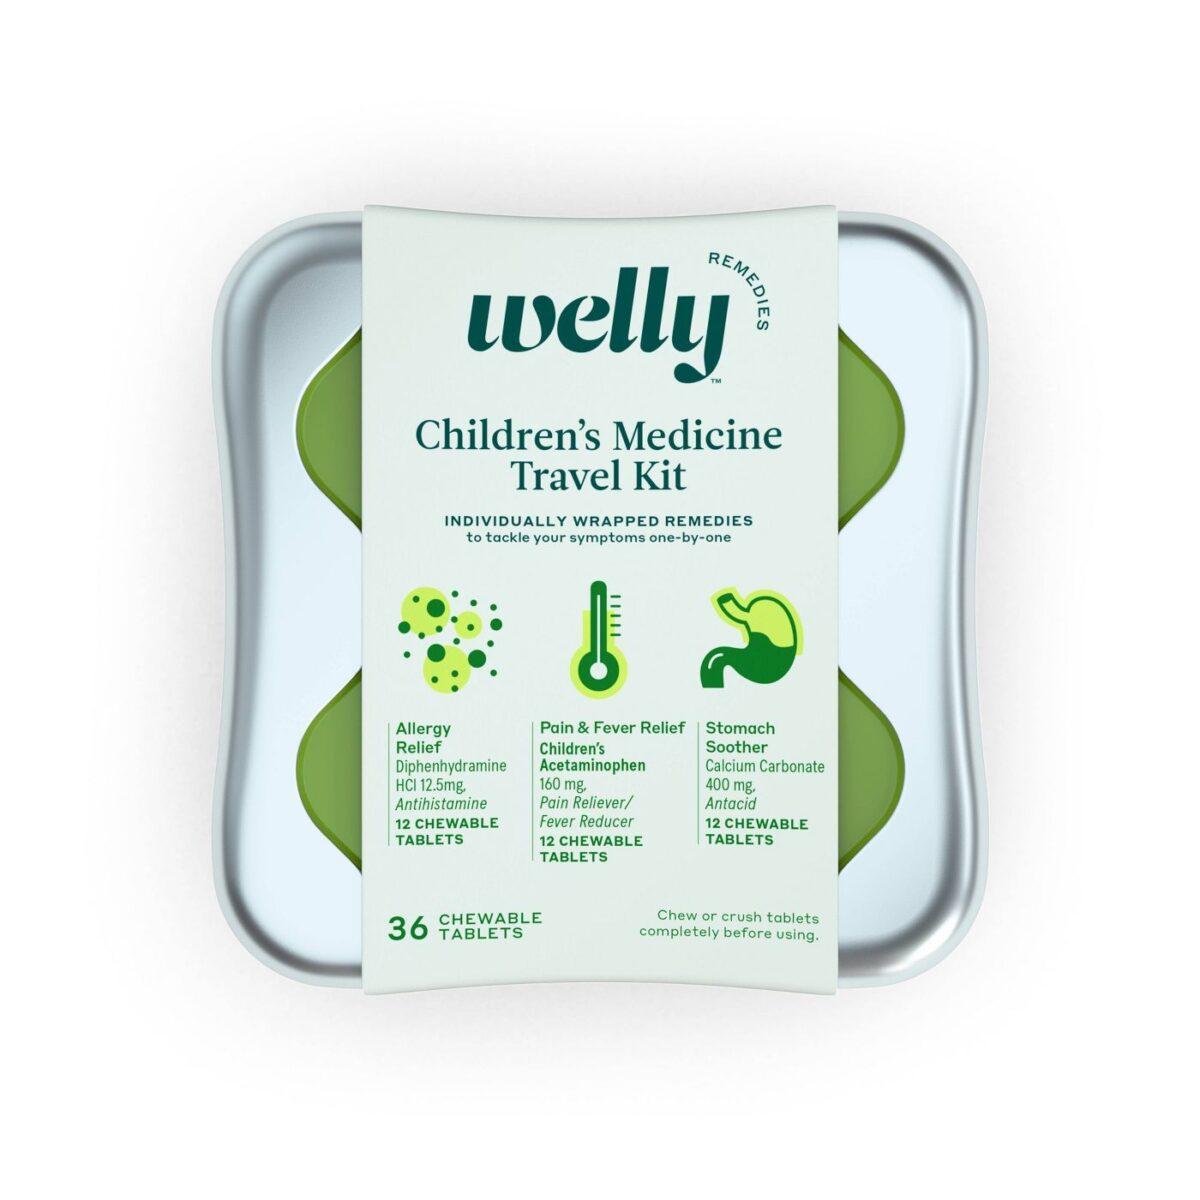 Welly kids medicine kit travel road trip necessities